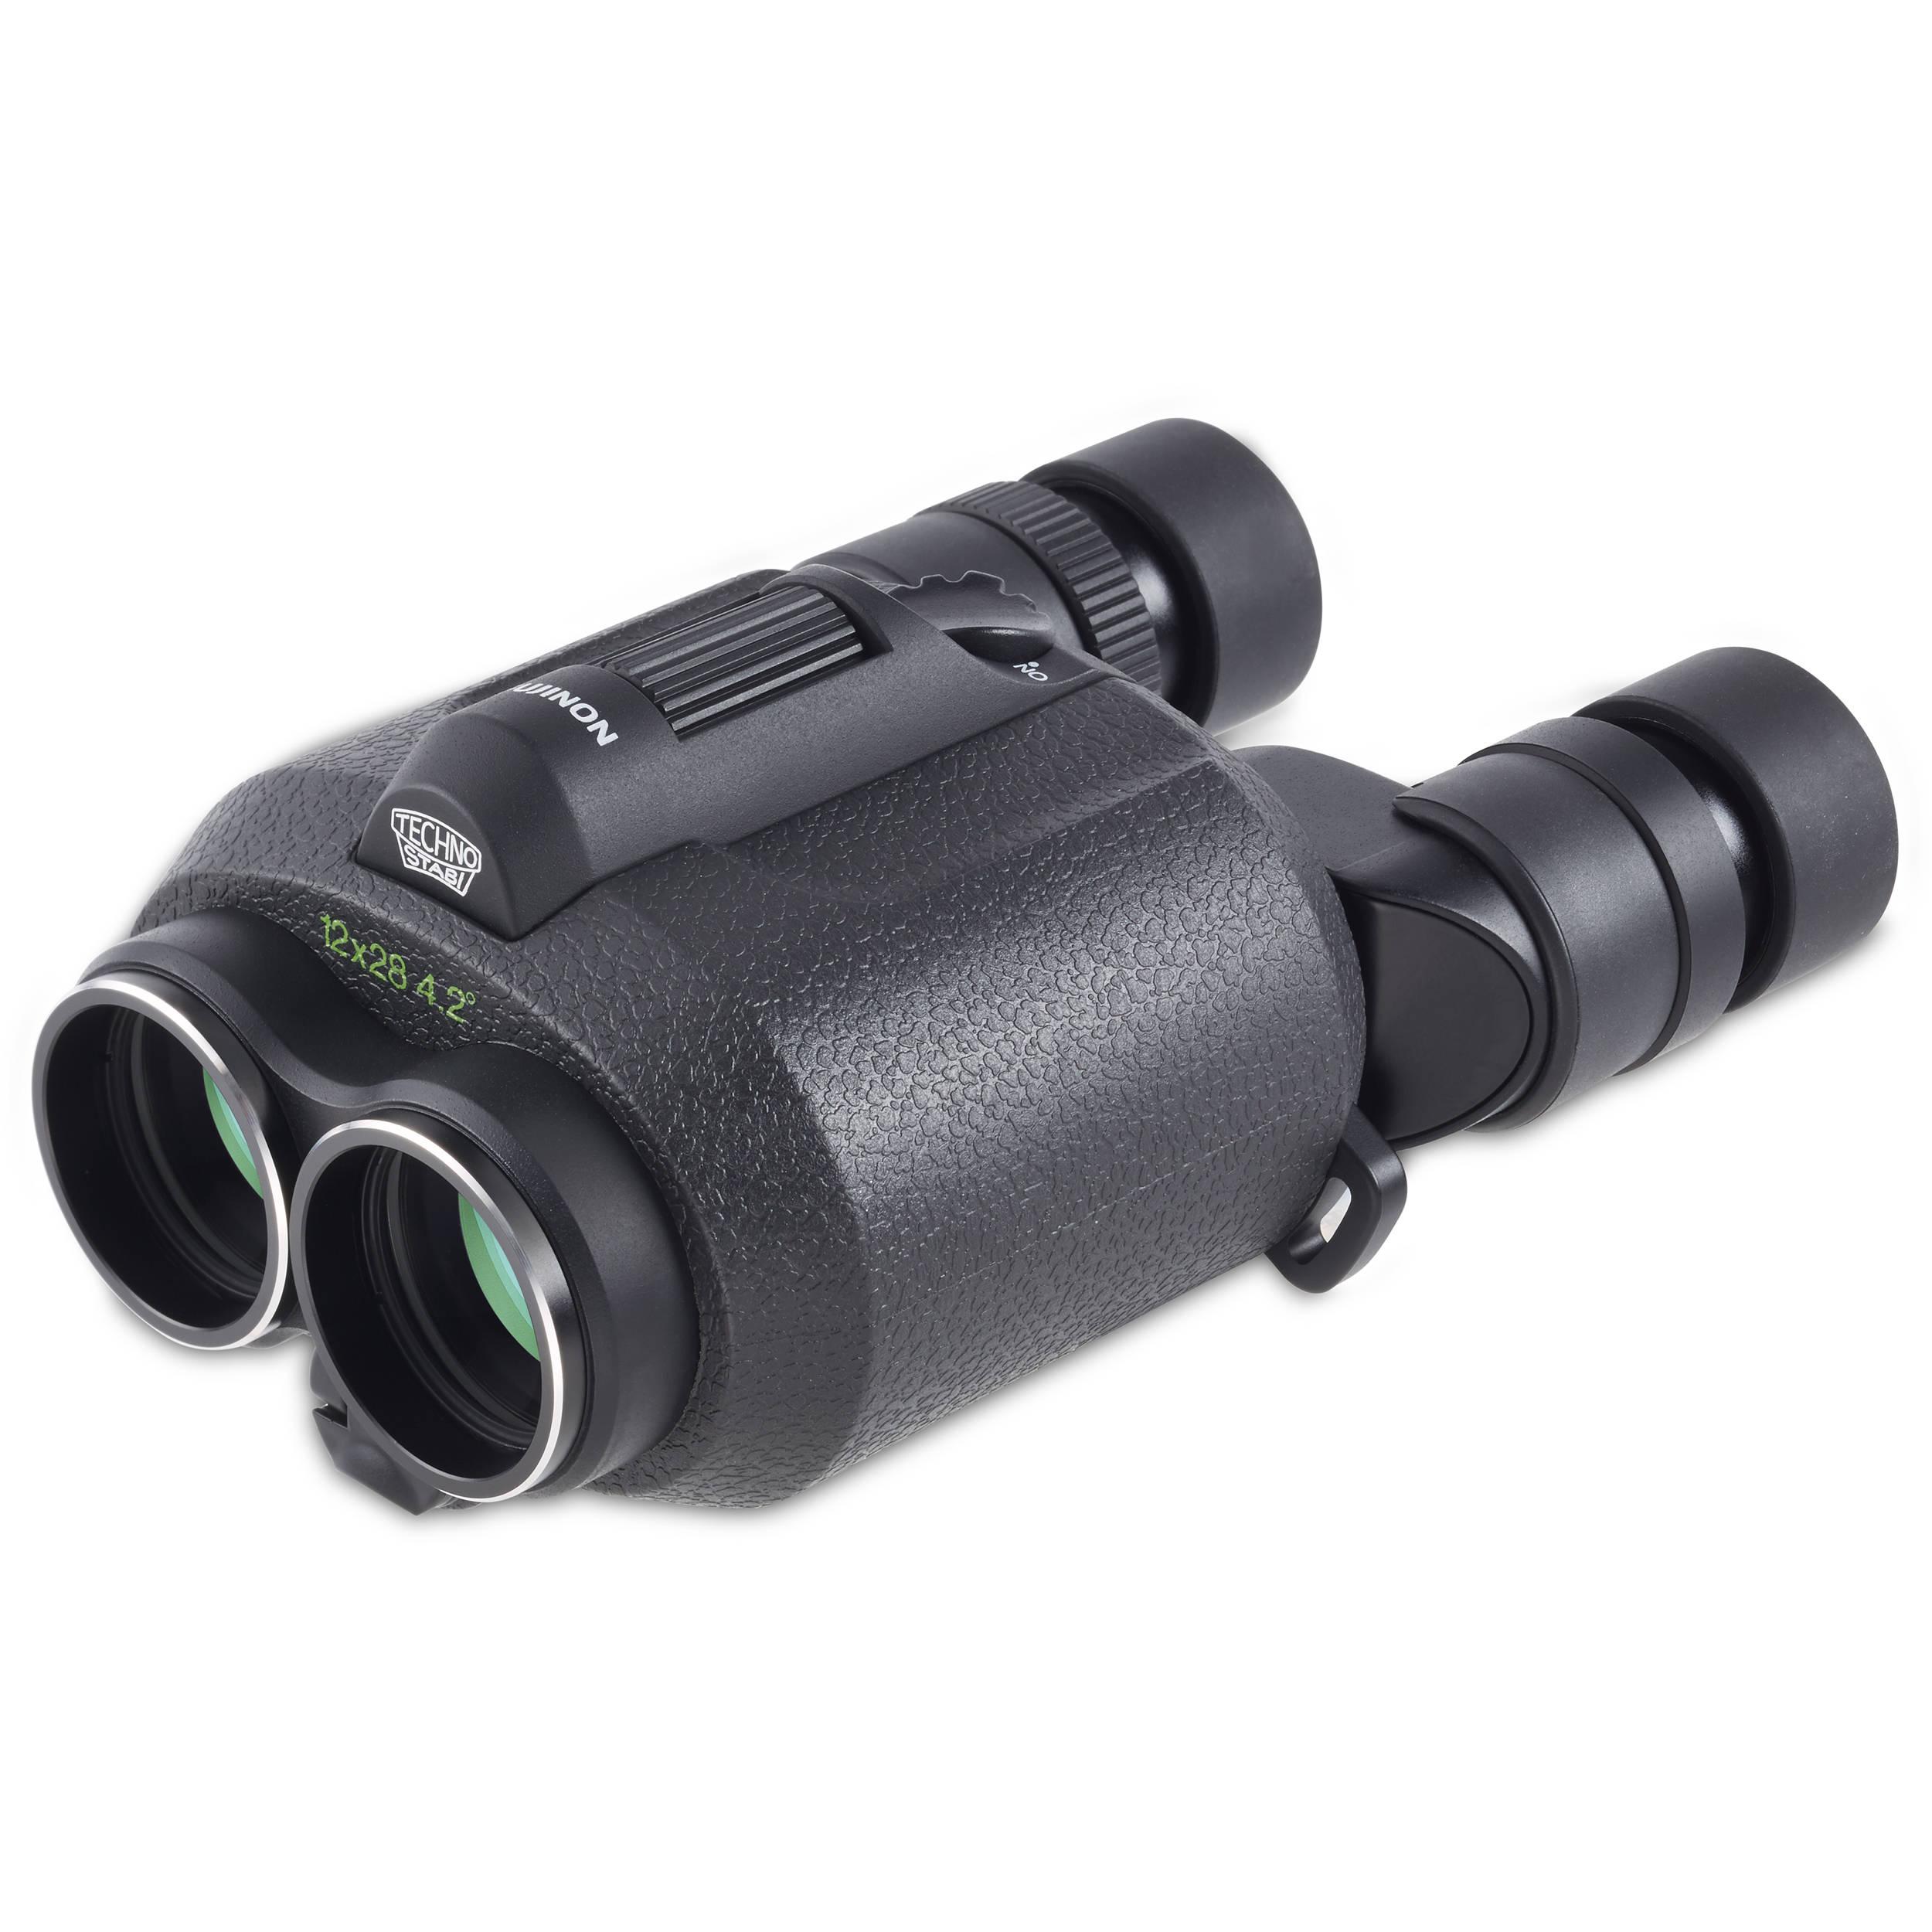 Fujinon 12x28 TS1228 Binoculars